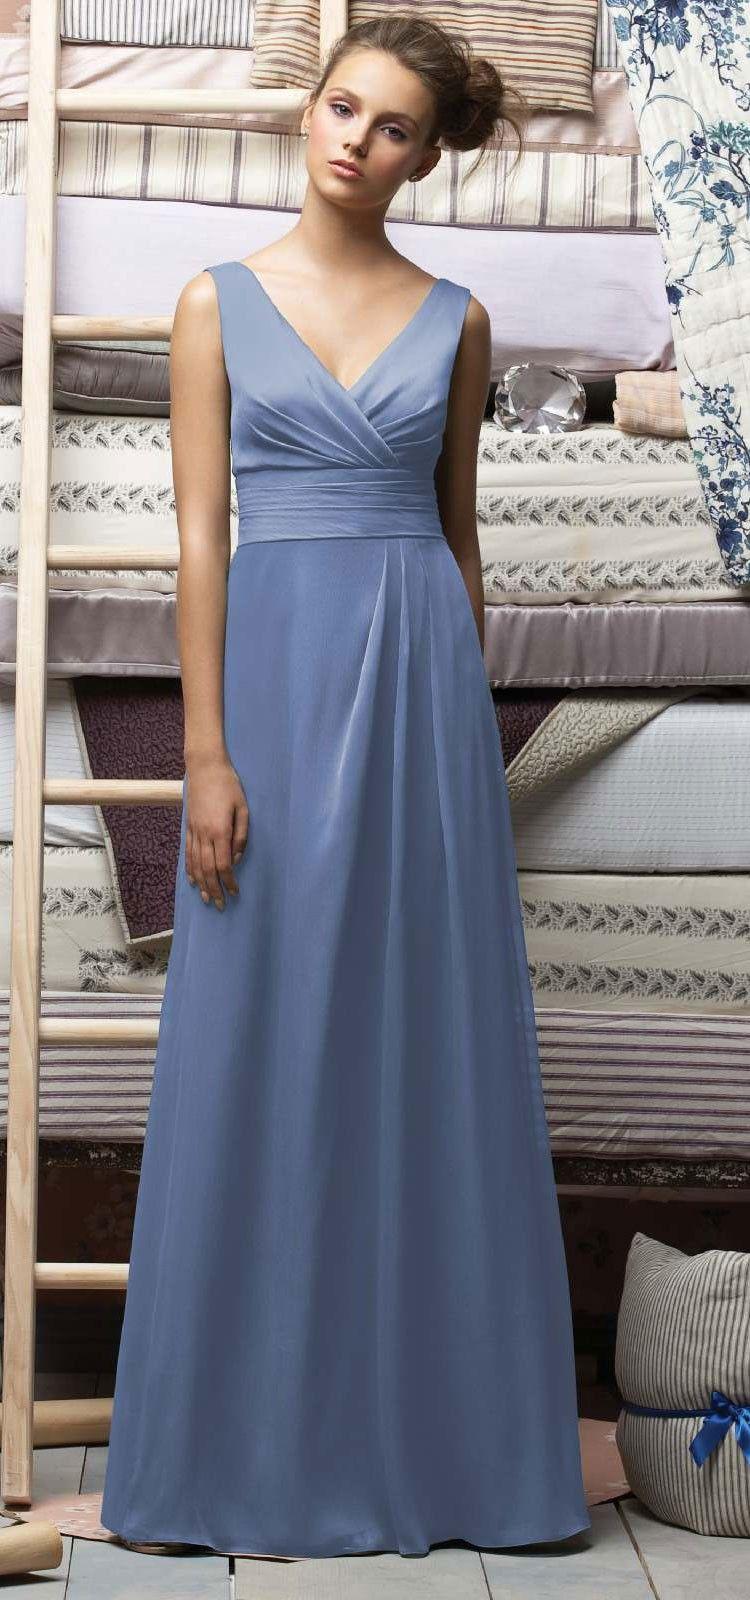 Lr142 Crinkle Chiffon Larkspur Designer Bridesmaid